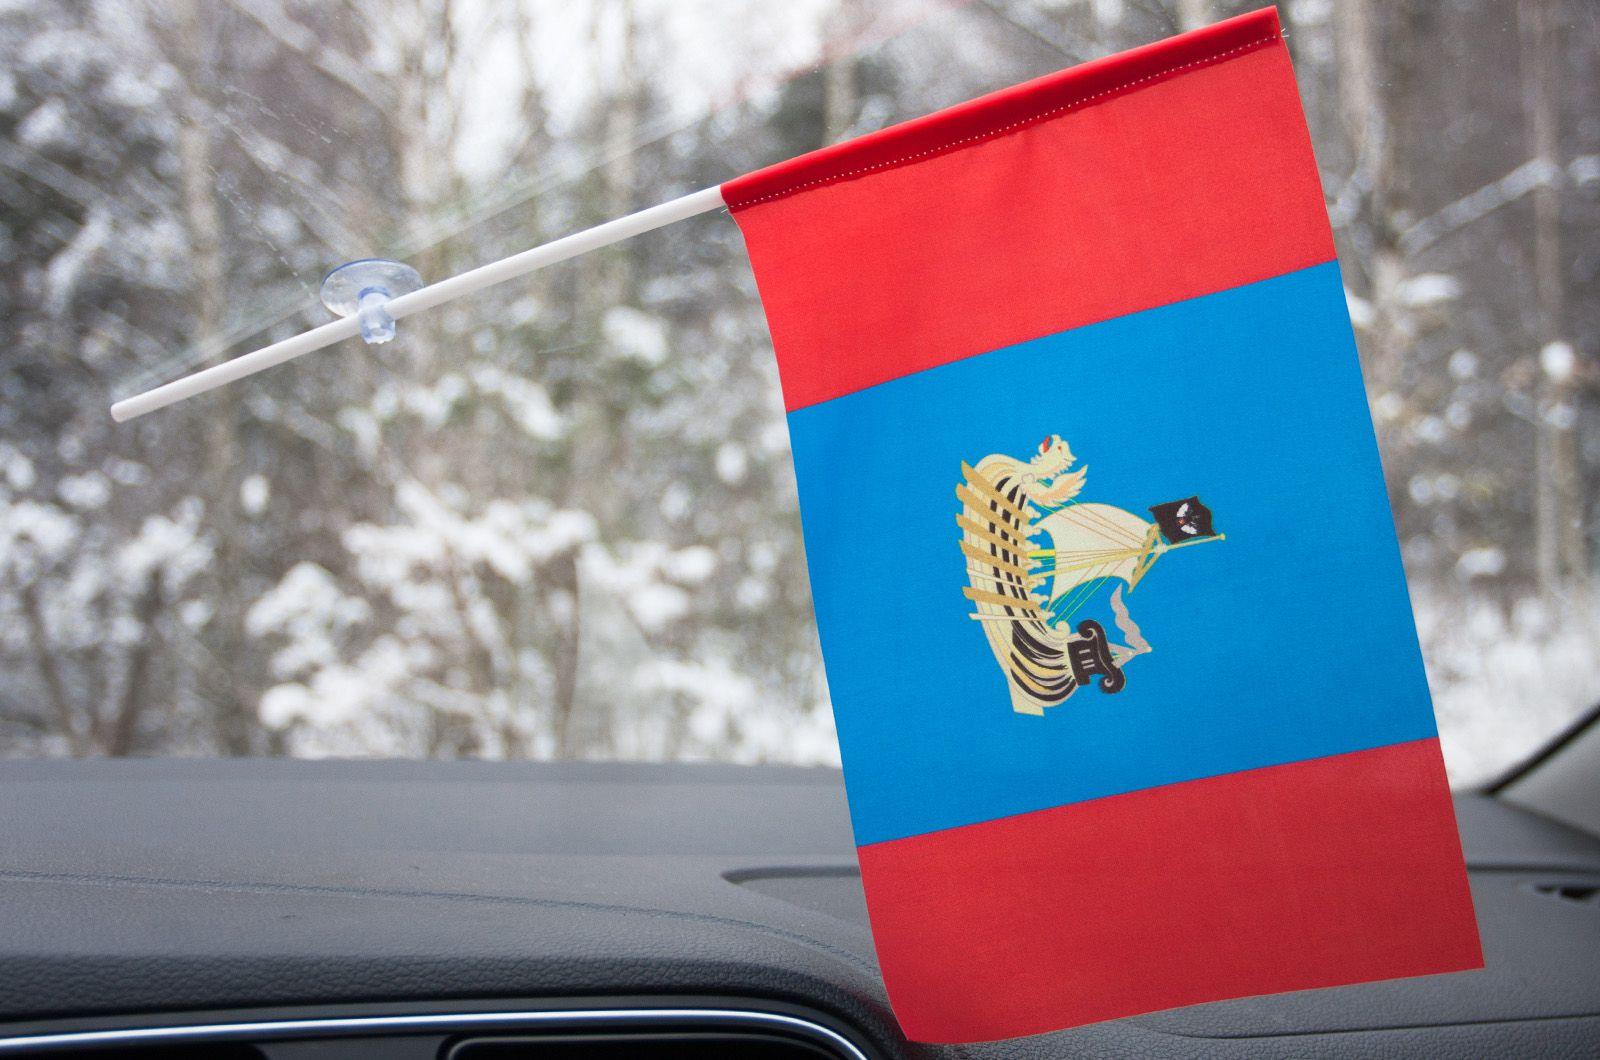 Флажок Костромской области в машину